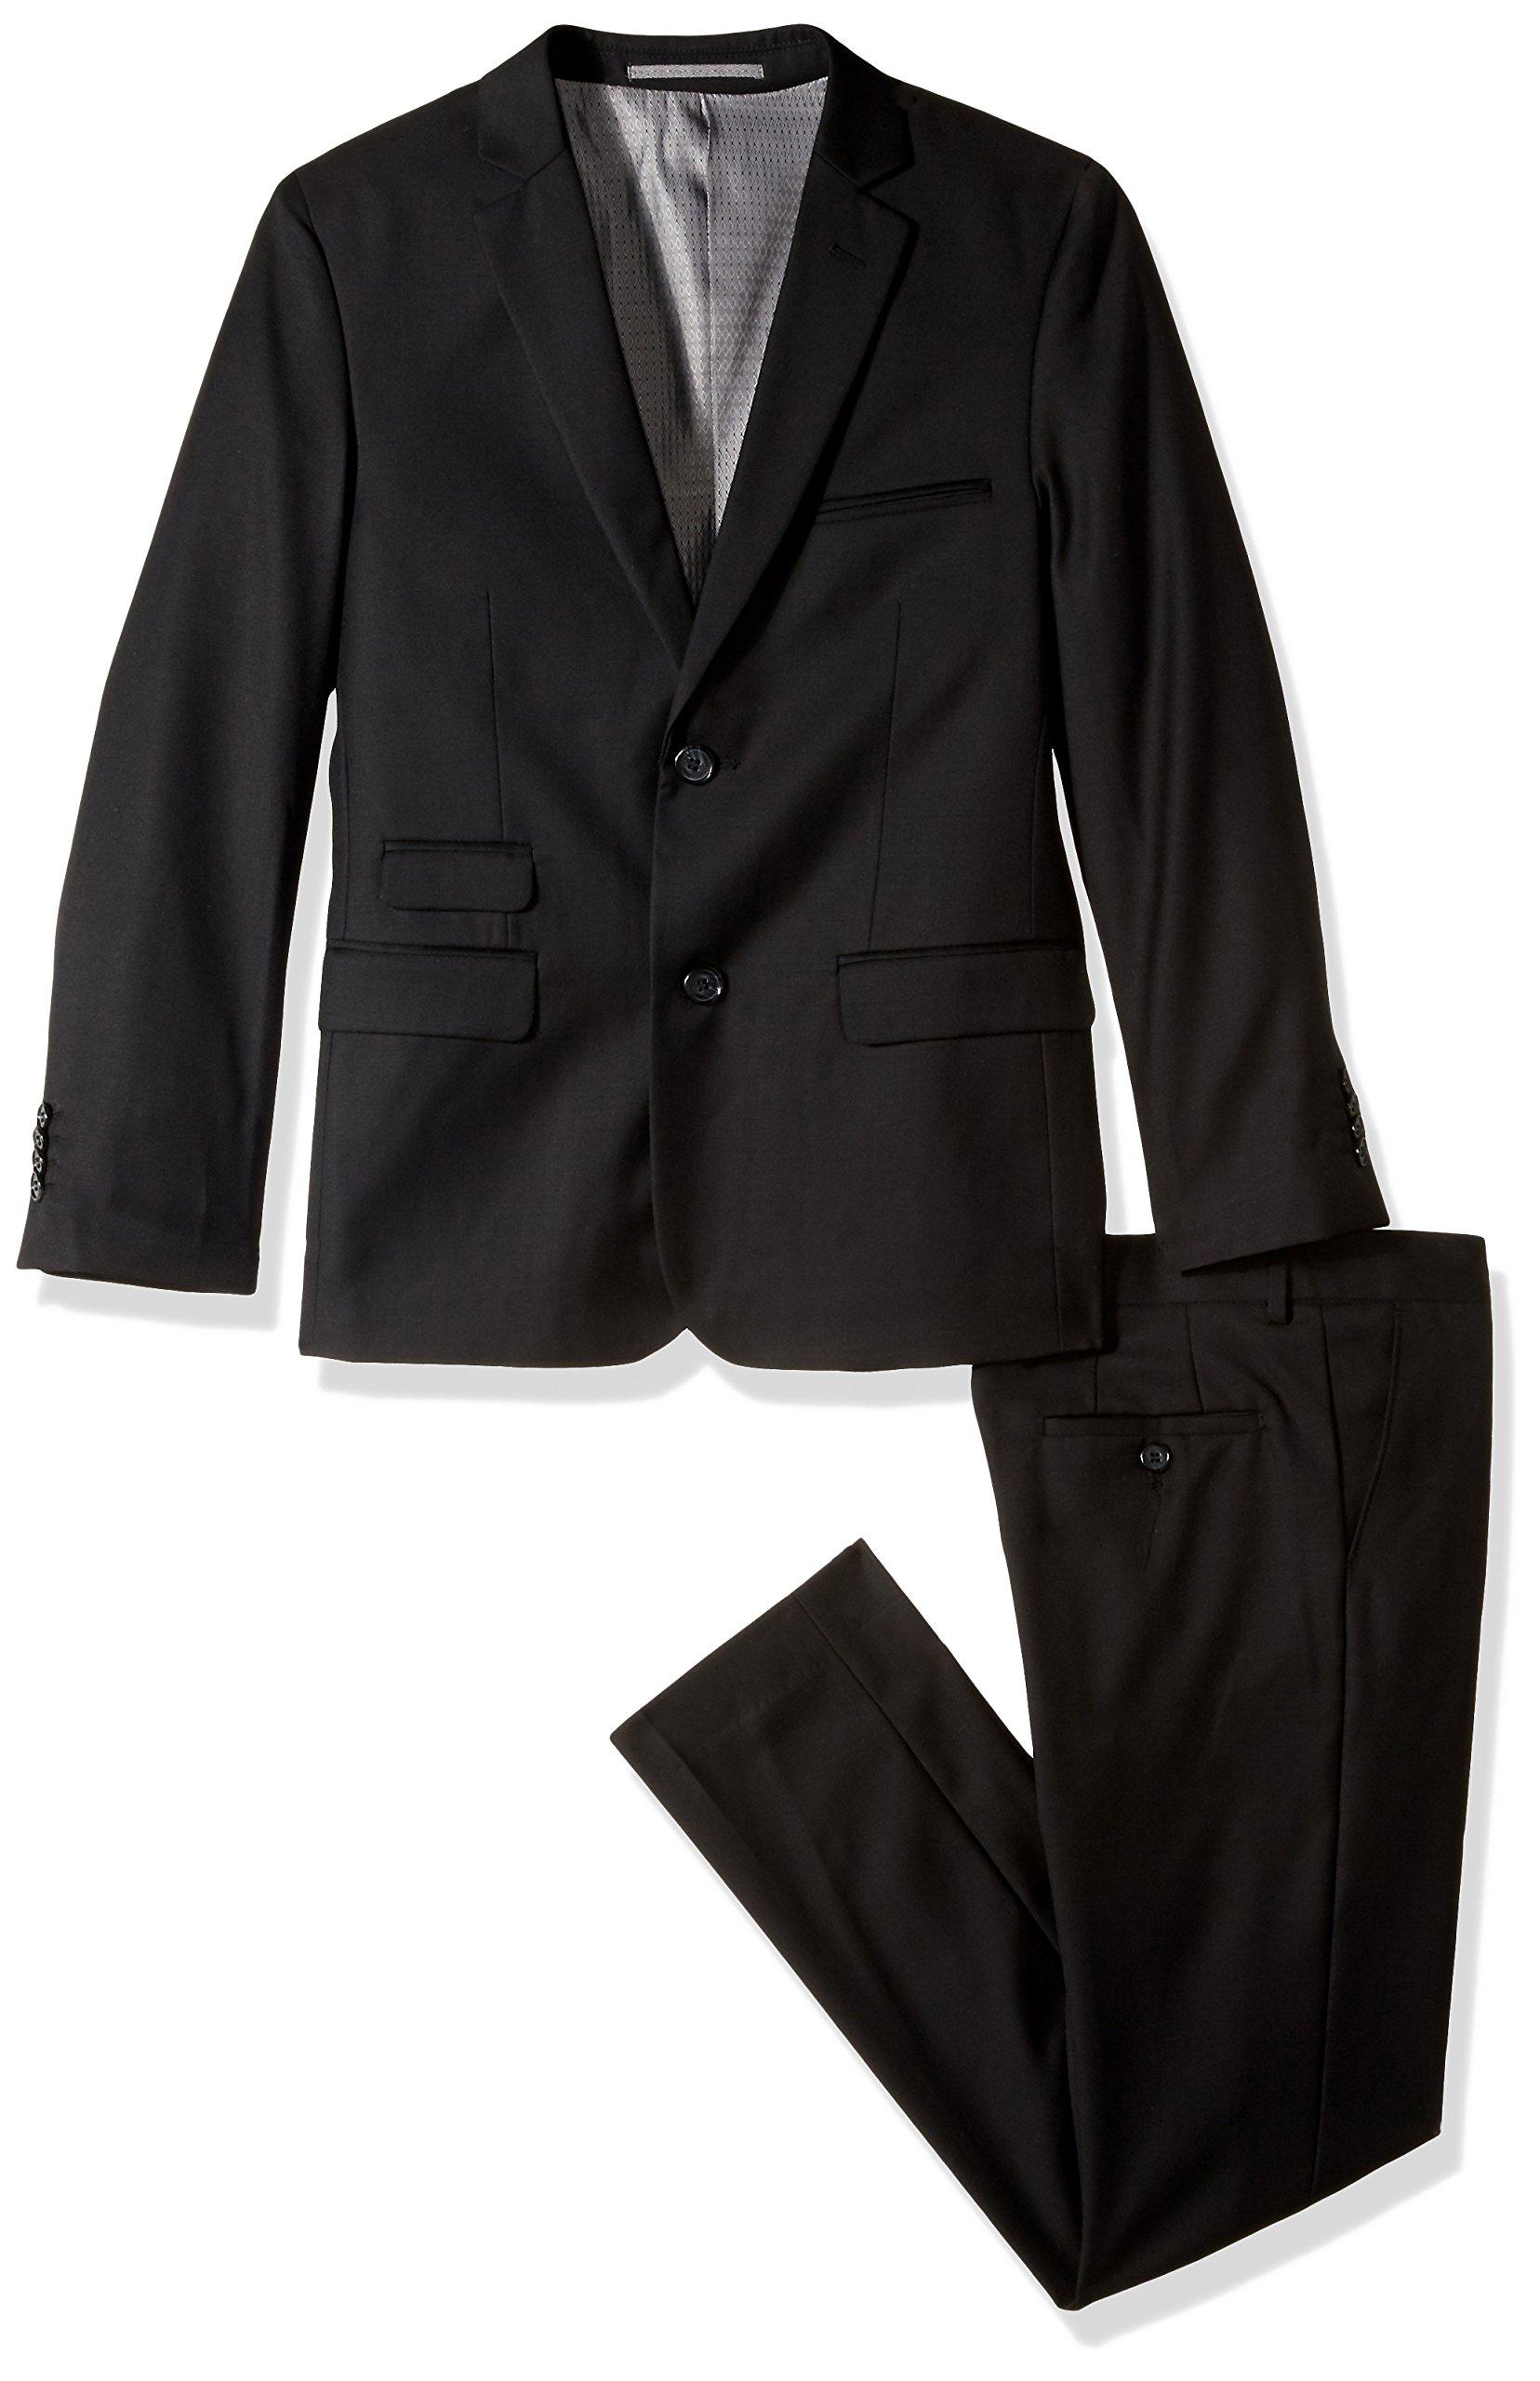 Isaac Mizrahi Boys' Big Solid 2pc Slim Fit Wool Suit, Black, 14